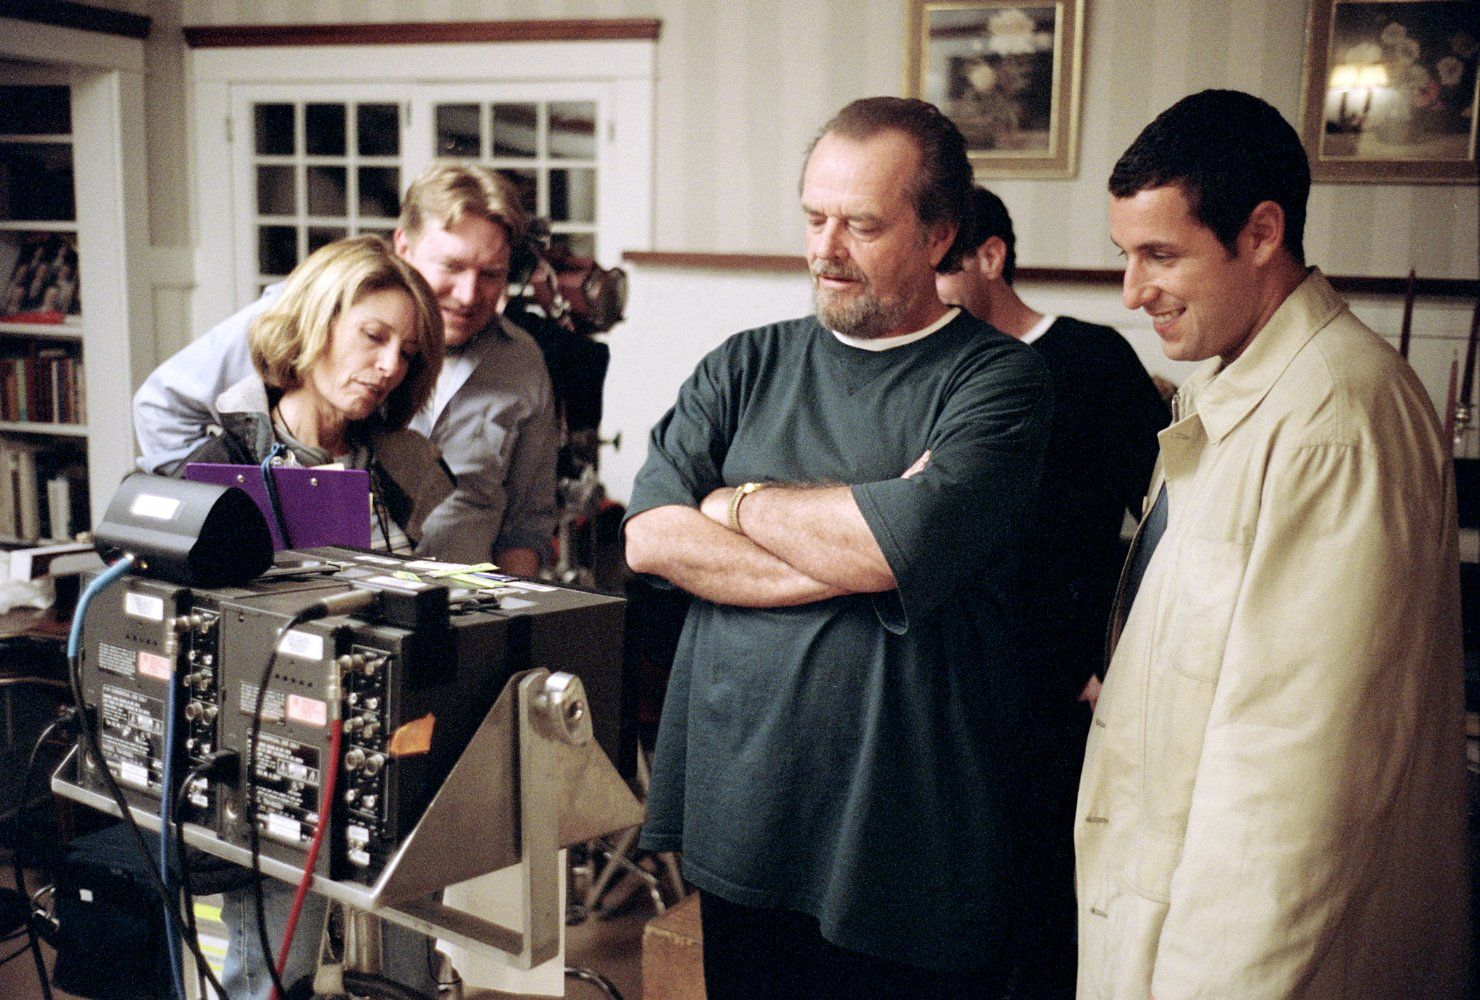 Jack Nicholson And Adam Sandler In Anger Management 2003 Adam Sandler Jack Nicholson Anger Management